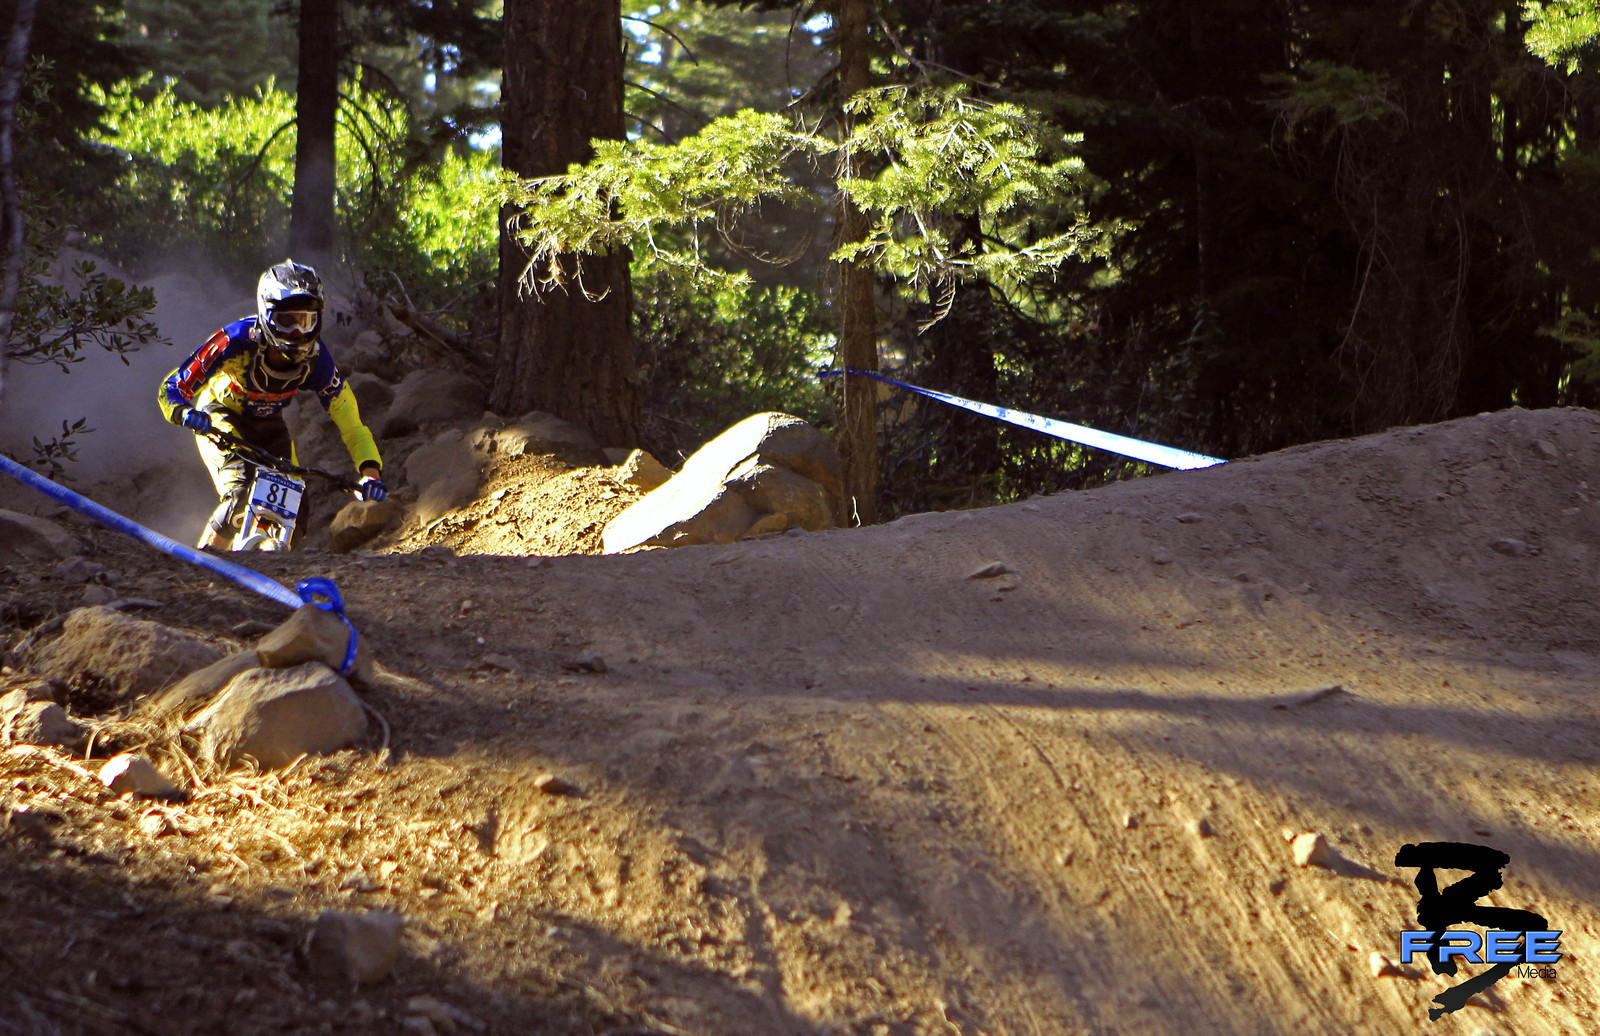 done7 1 - GnarHuck - Mountain Biking Pictures - Vital MTB